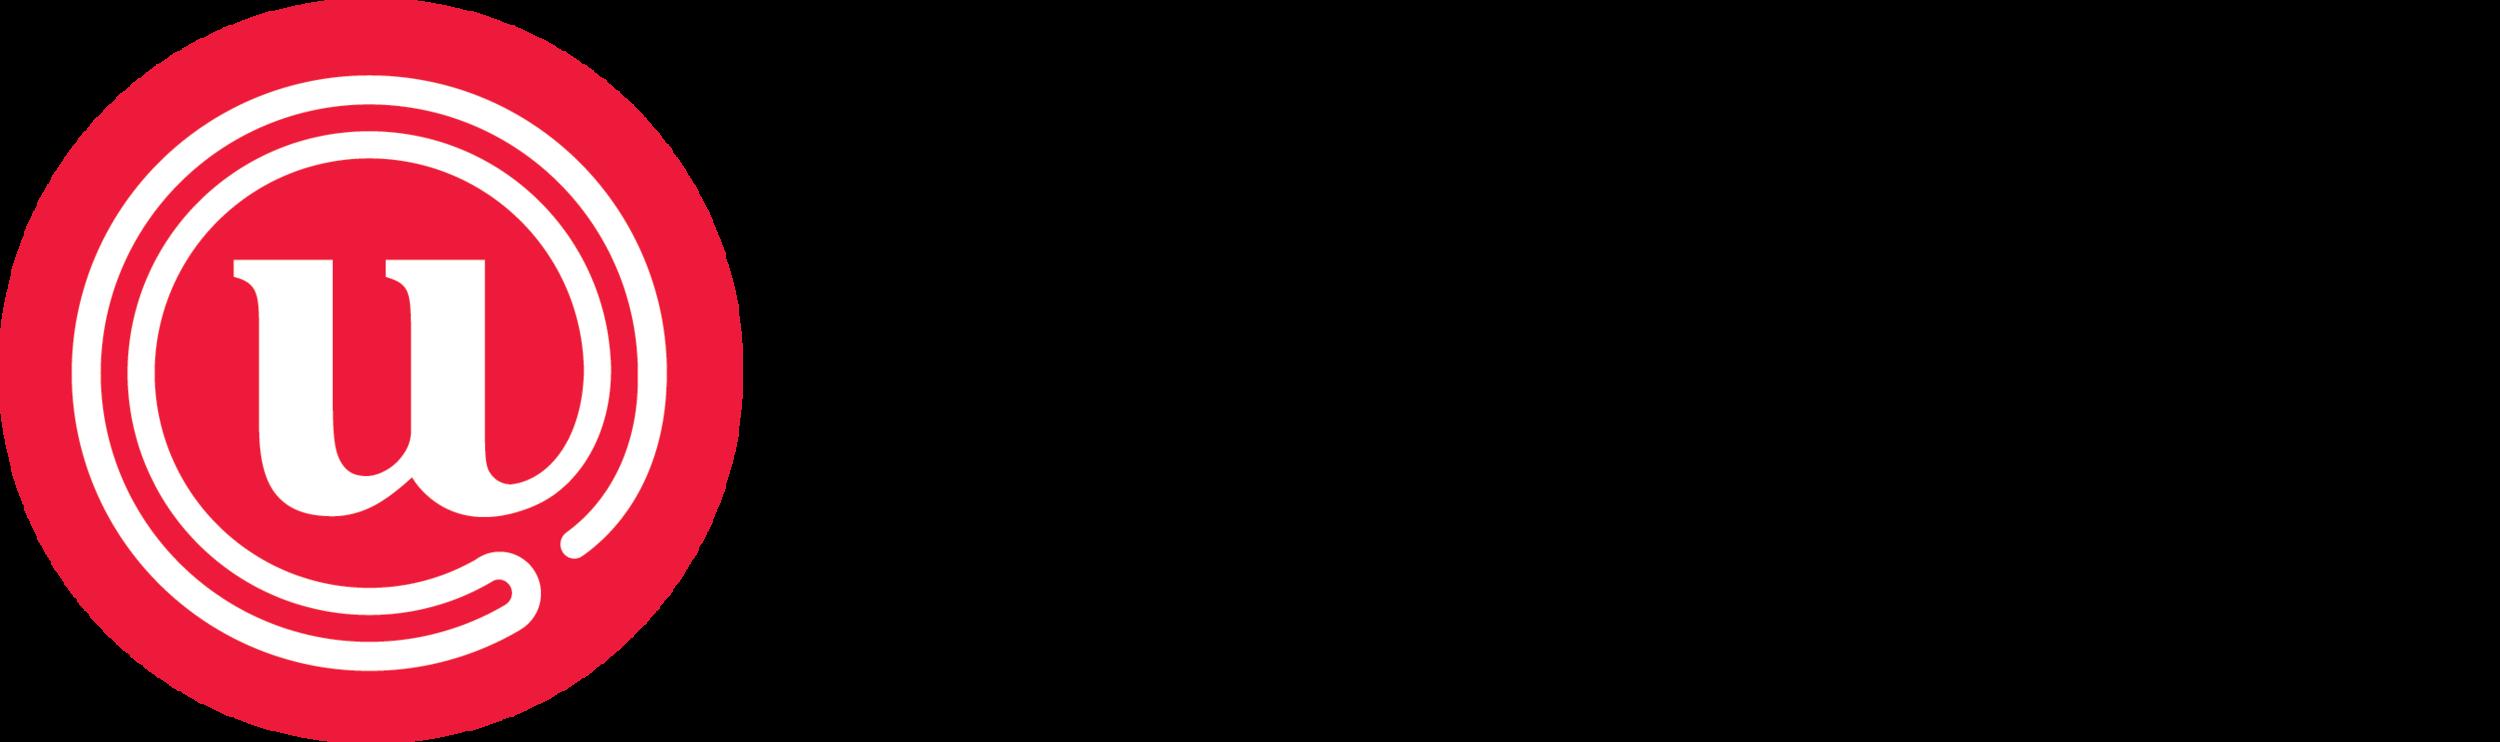 Narrowsburg Union_Logo.png